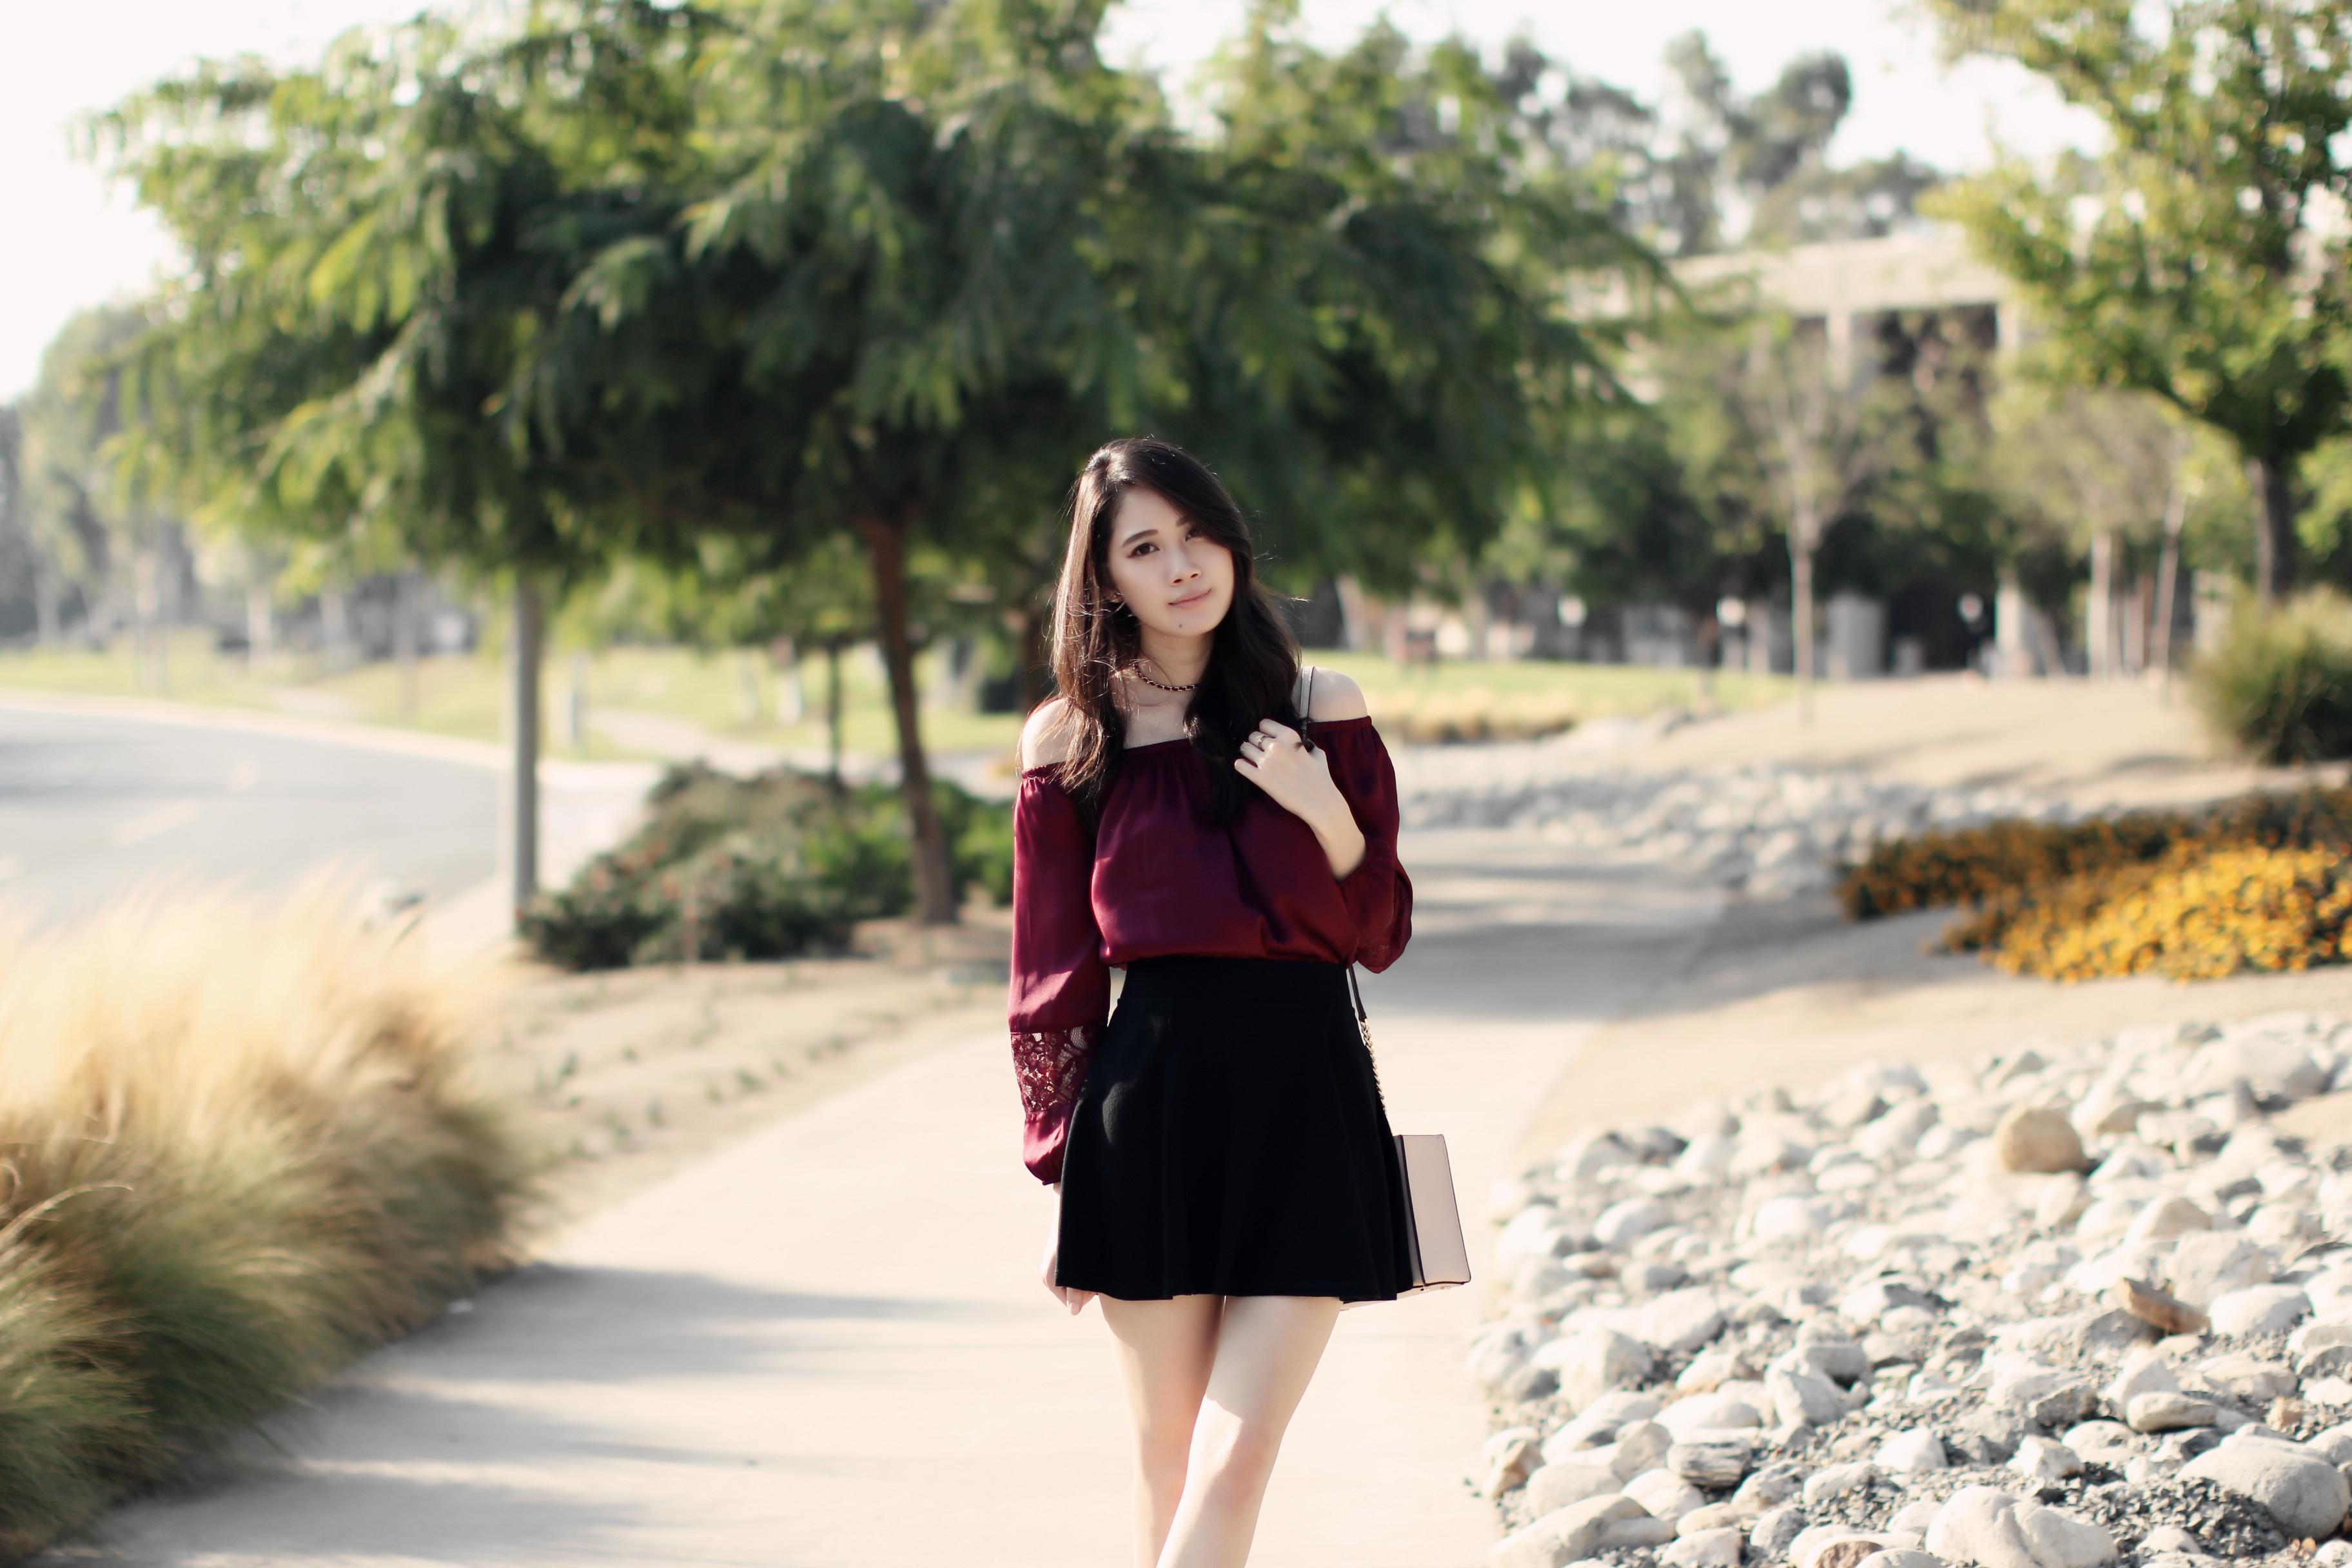 3589-ootd-fashion-style-outfitoftheday-wiwt-silk-lace-fallfashion-forever21-f21xme-elizabeeetht-clothestoyouuu